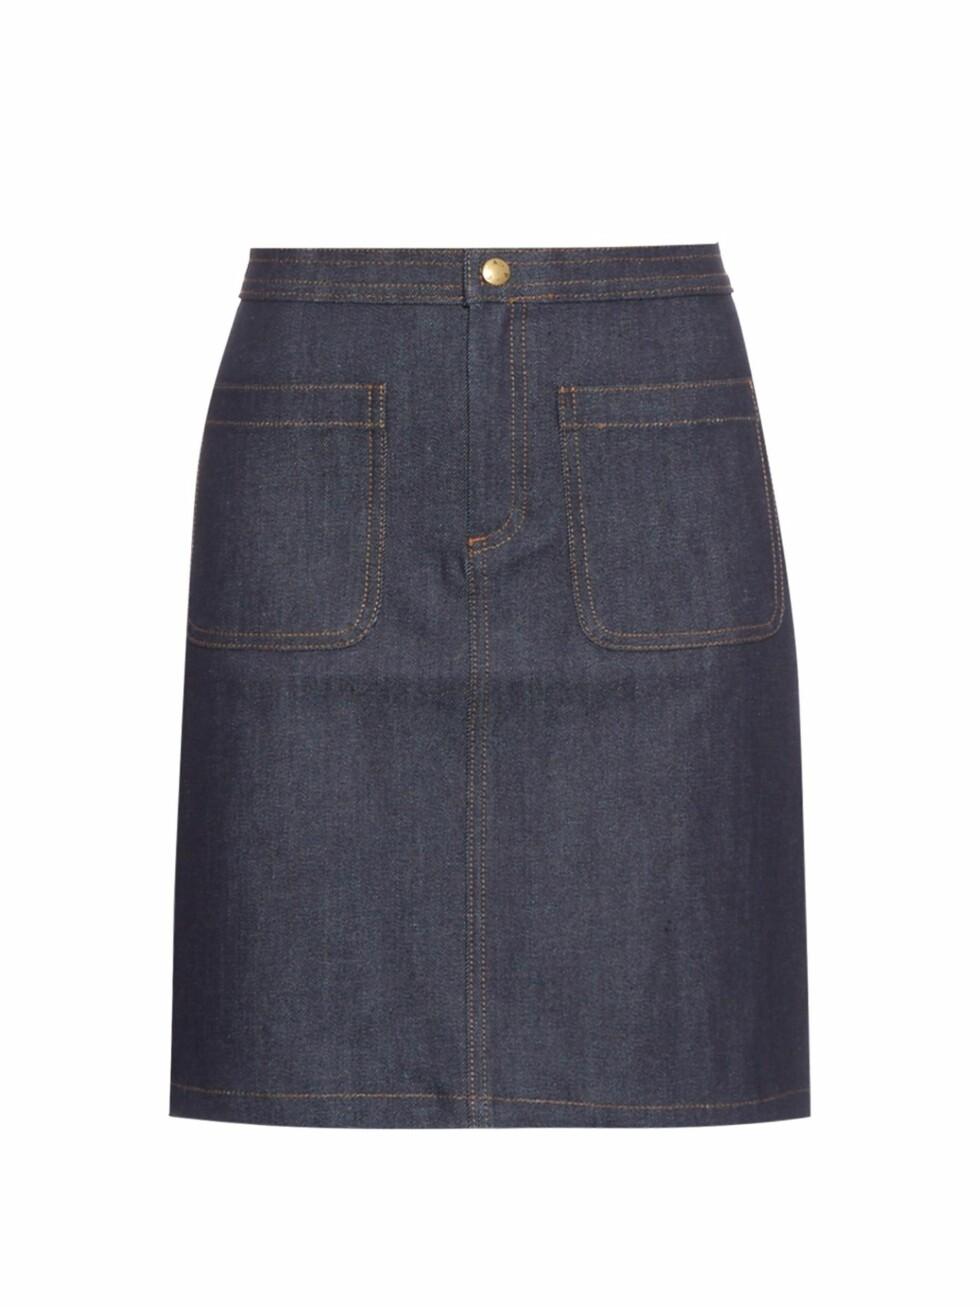 Skjørt fra APC |830,-| https://www.matchesfashion.com/intl/products/A-P-C--Patch-pocket-denim-skirt--1037518